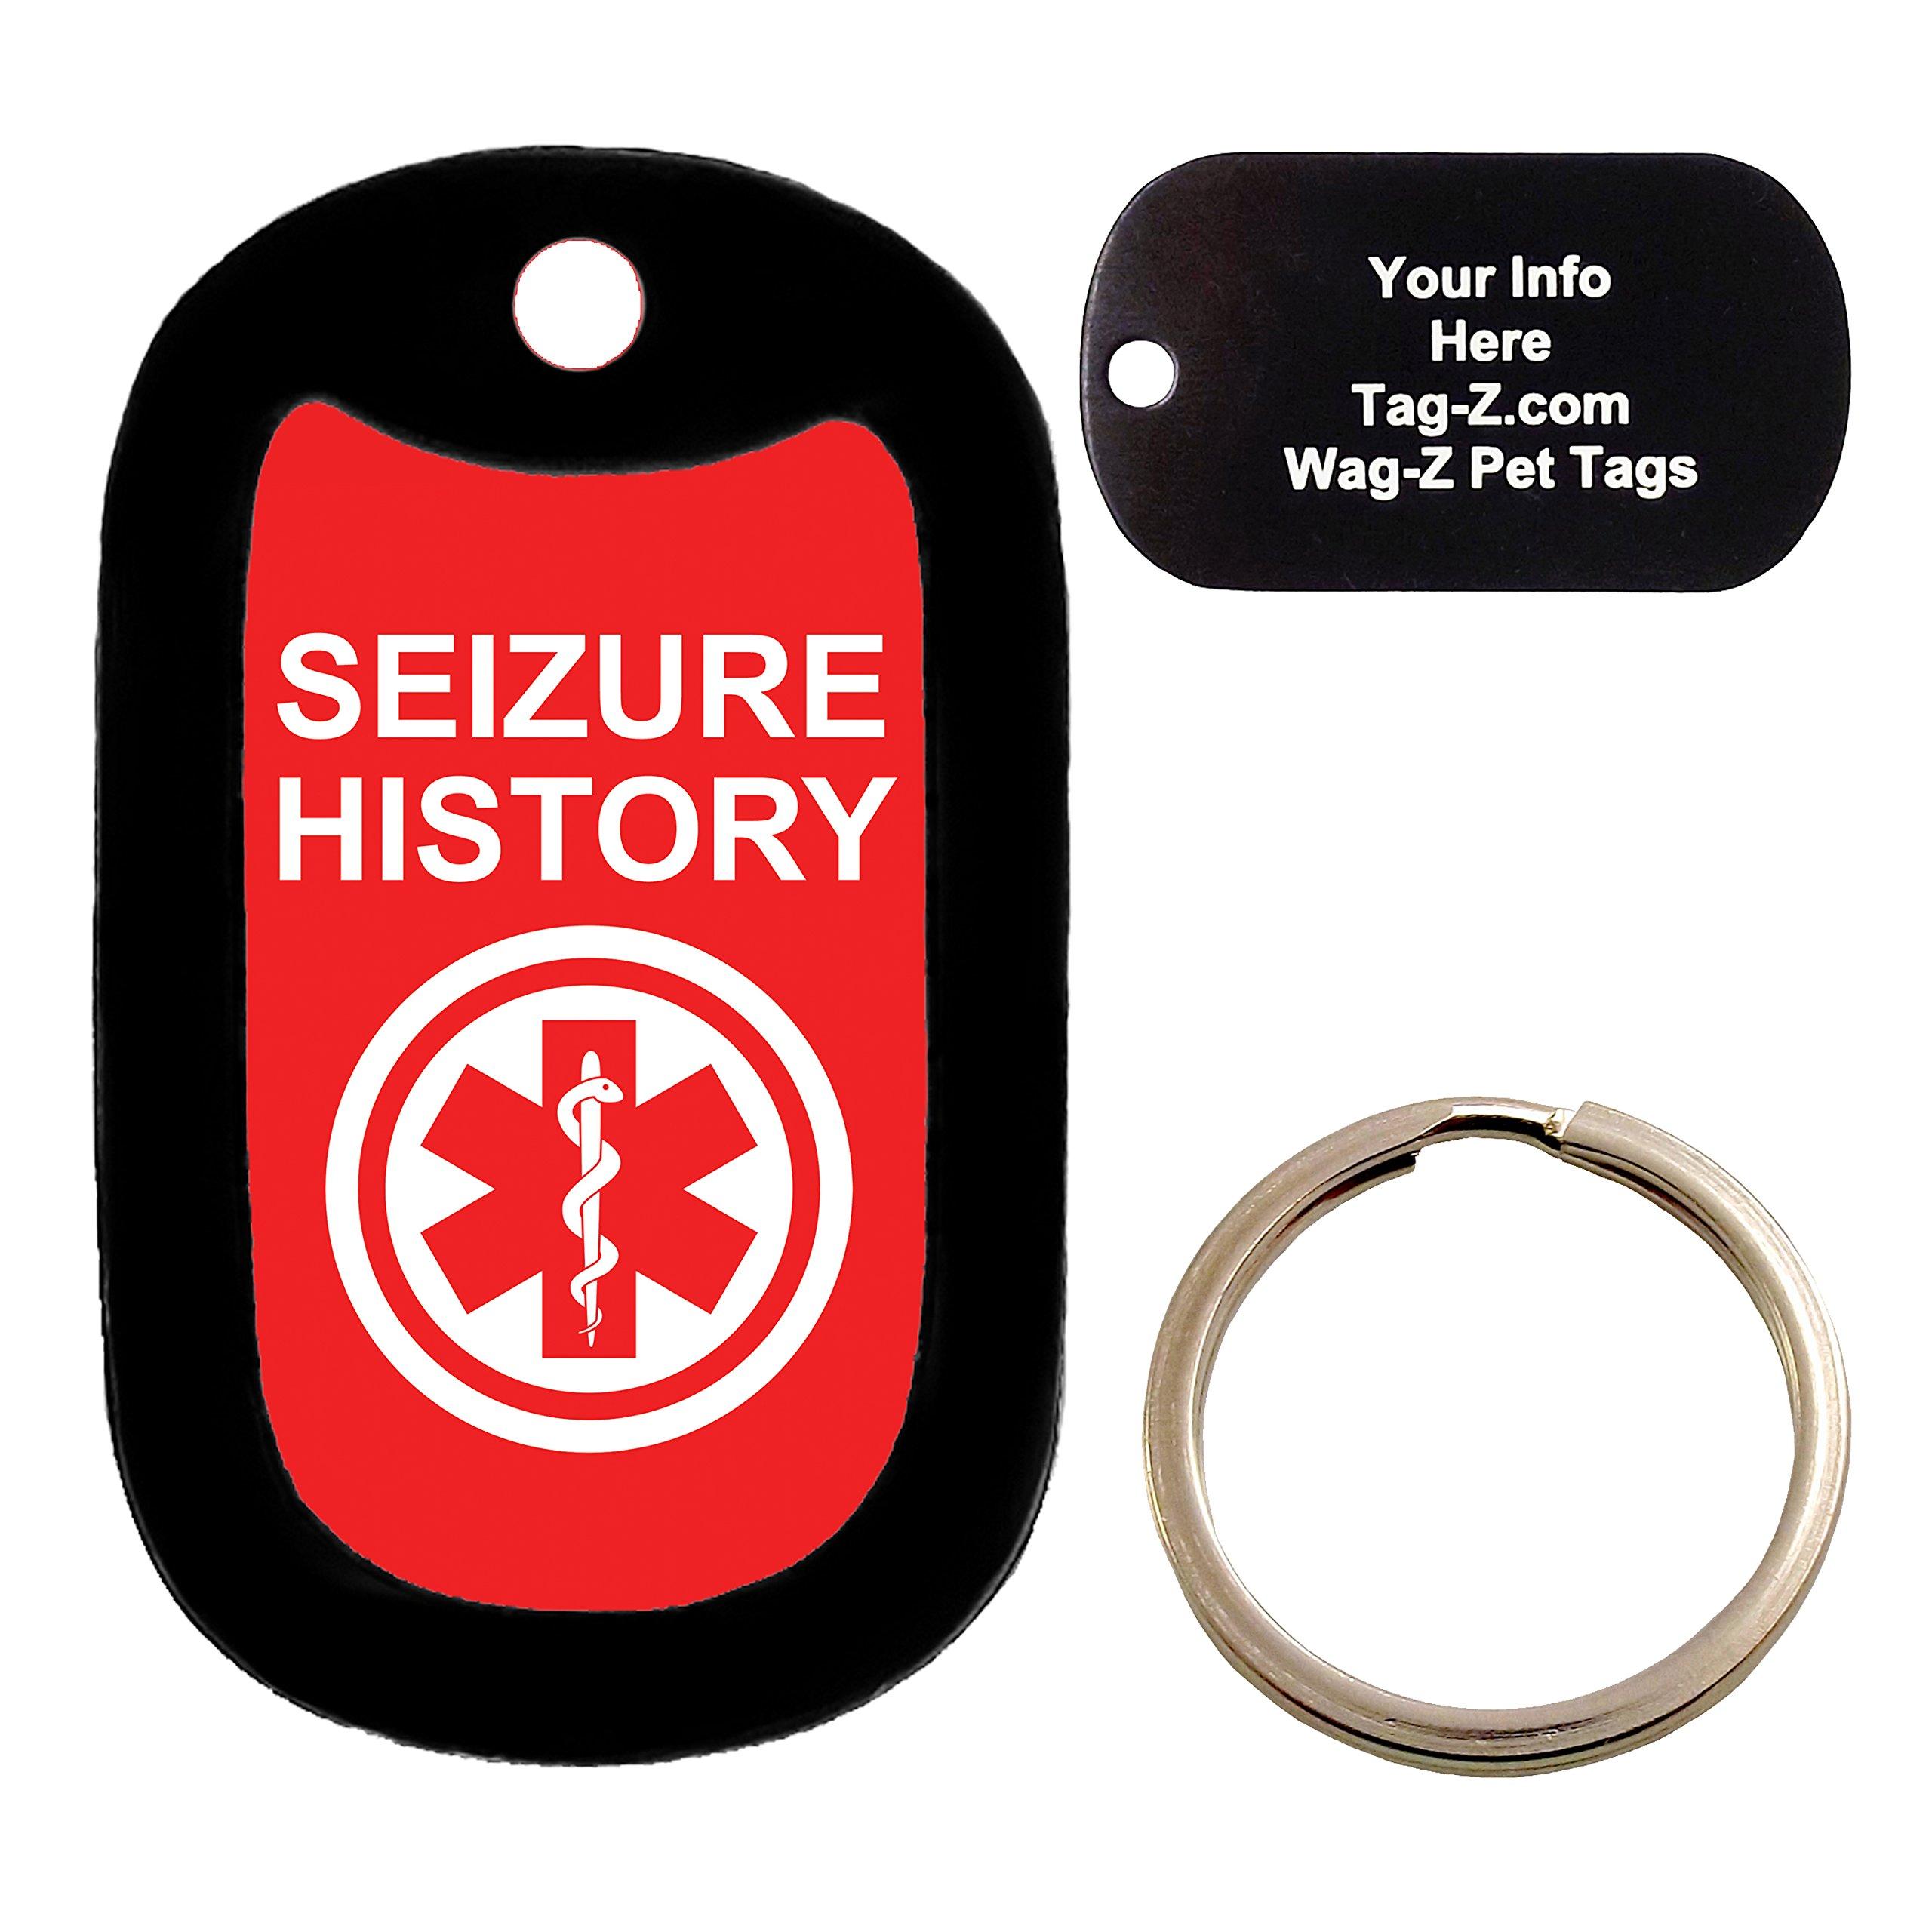 Custom Engraved Pet Tag - medical alert SEIZURE